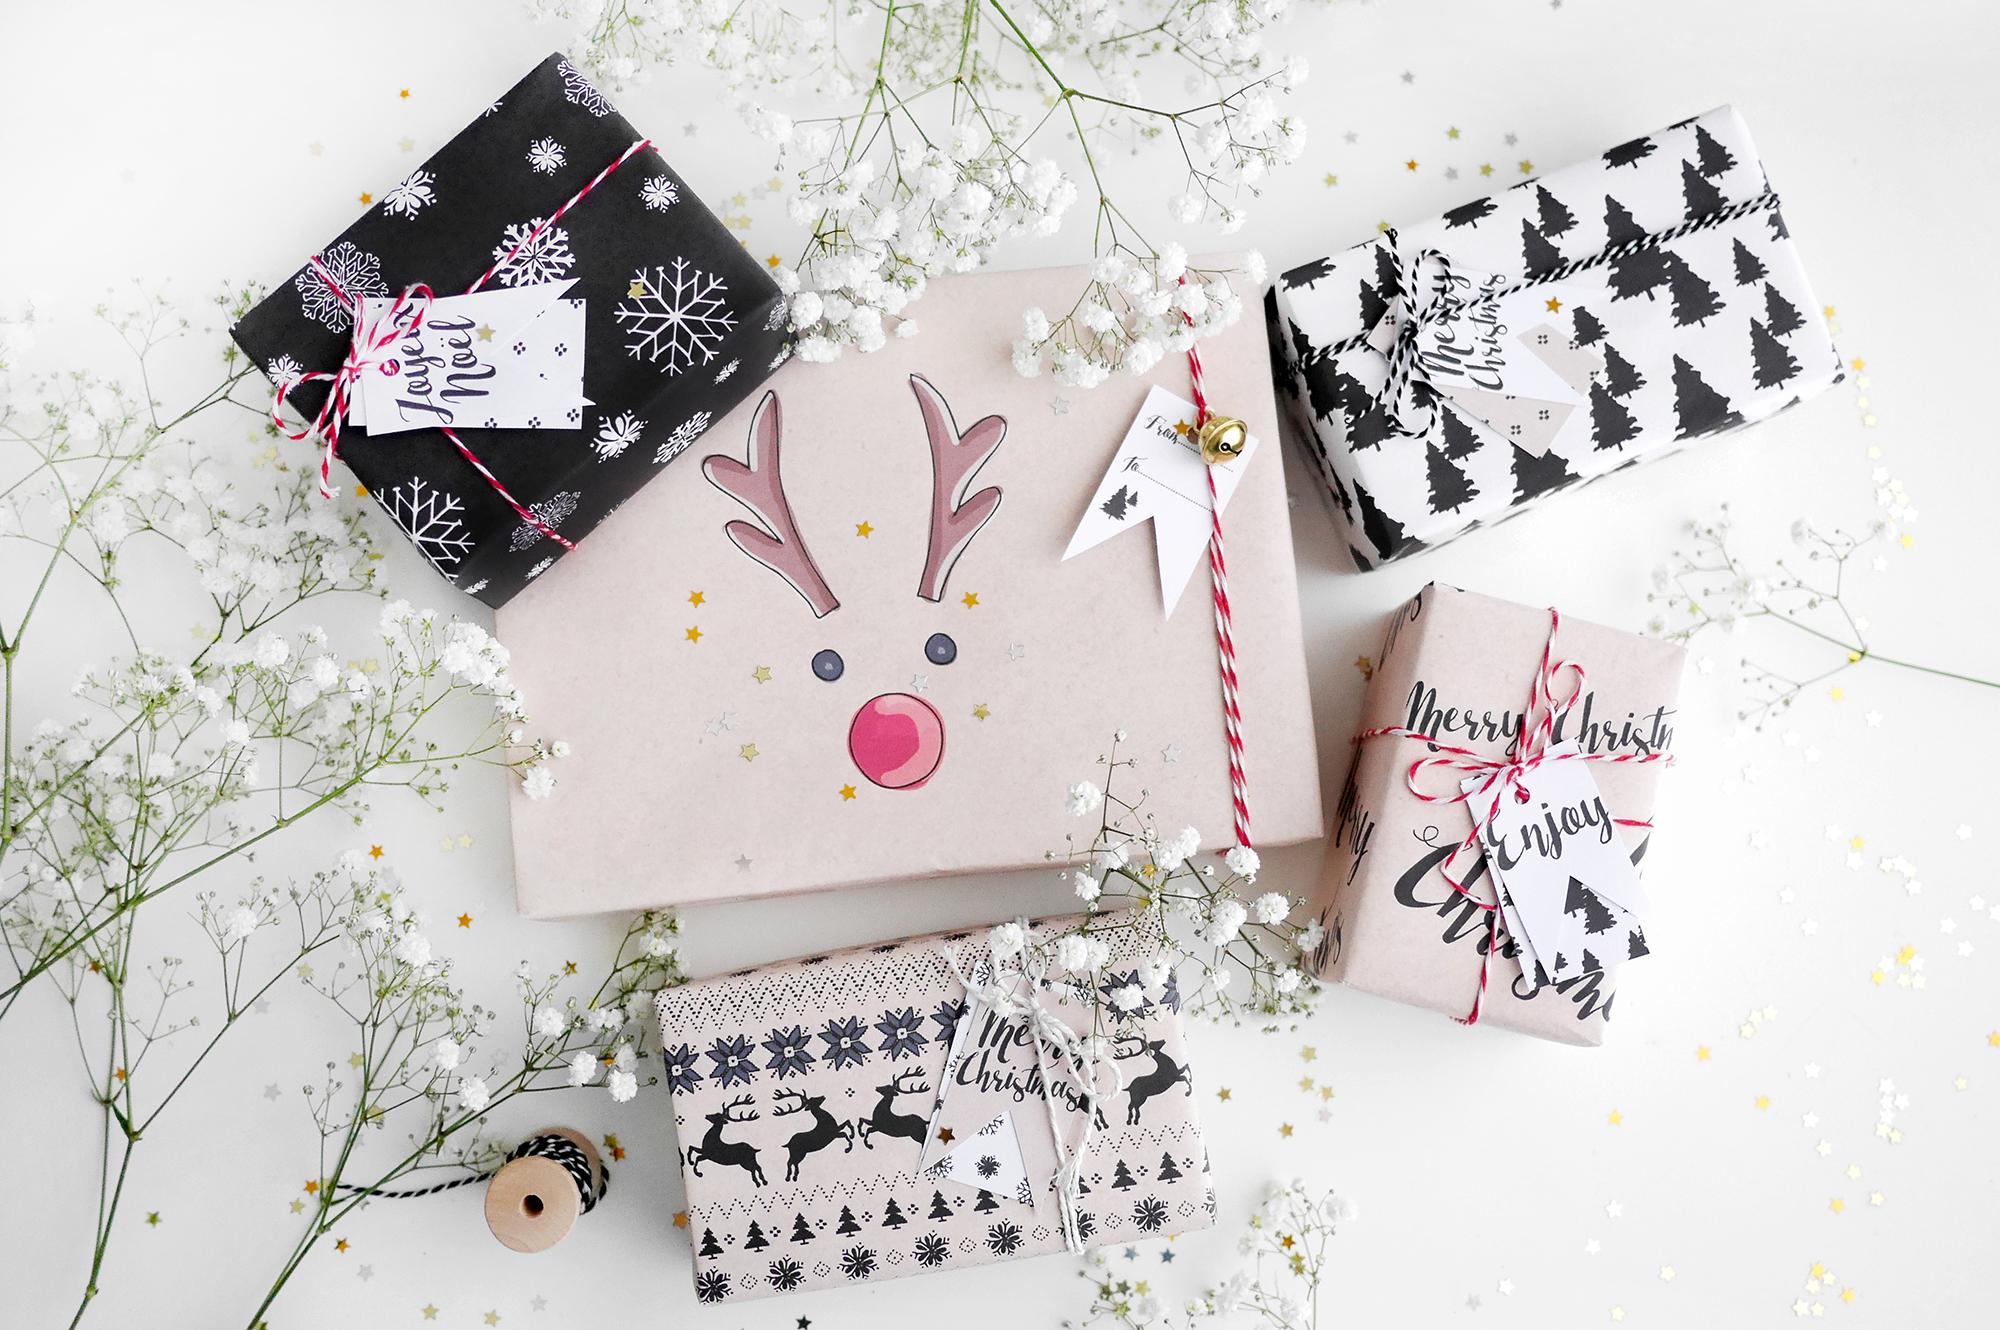 Kerstmis 2016 cadeauverpakking en labels